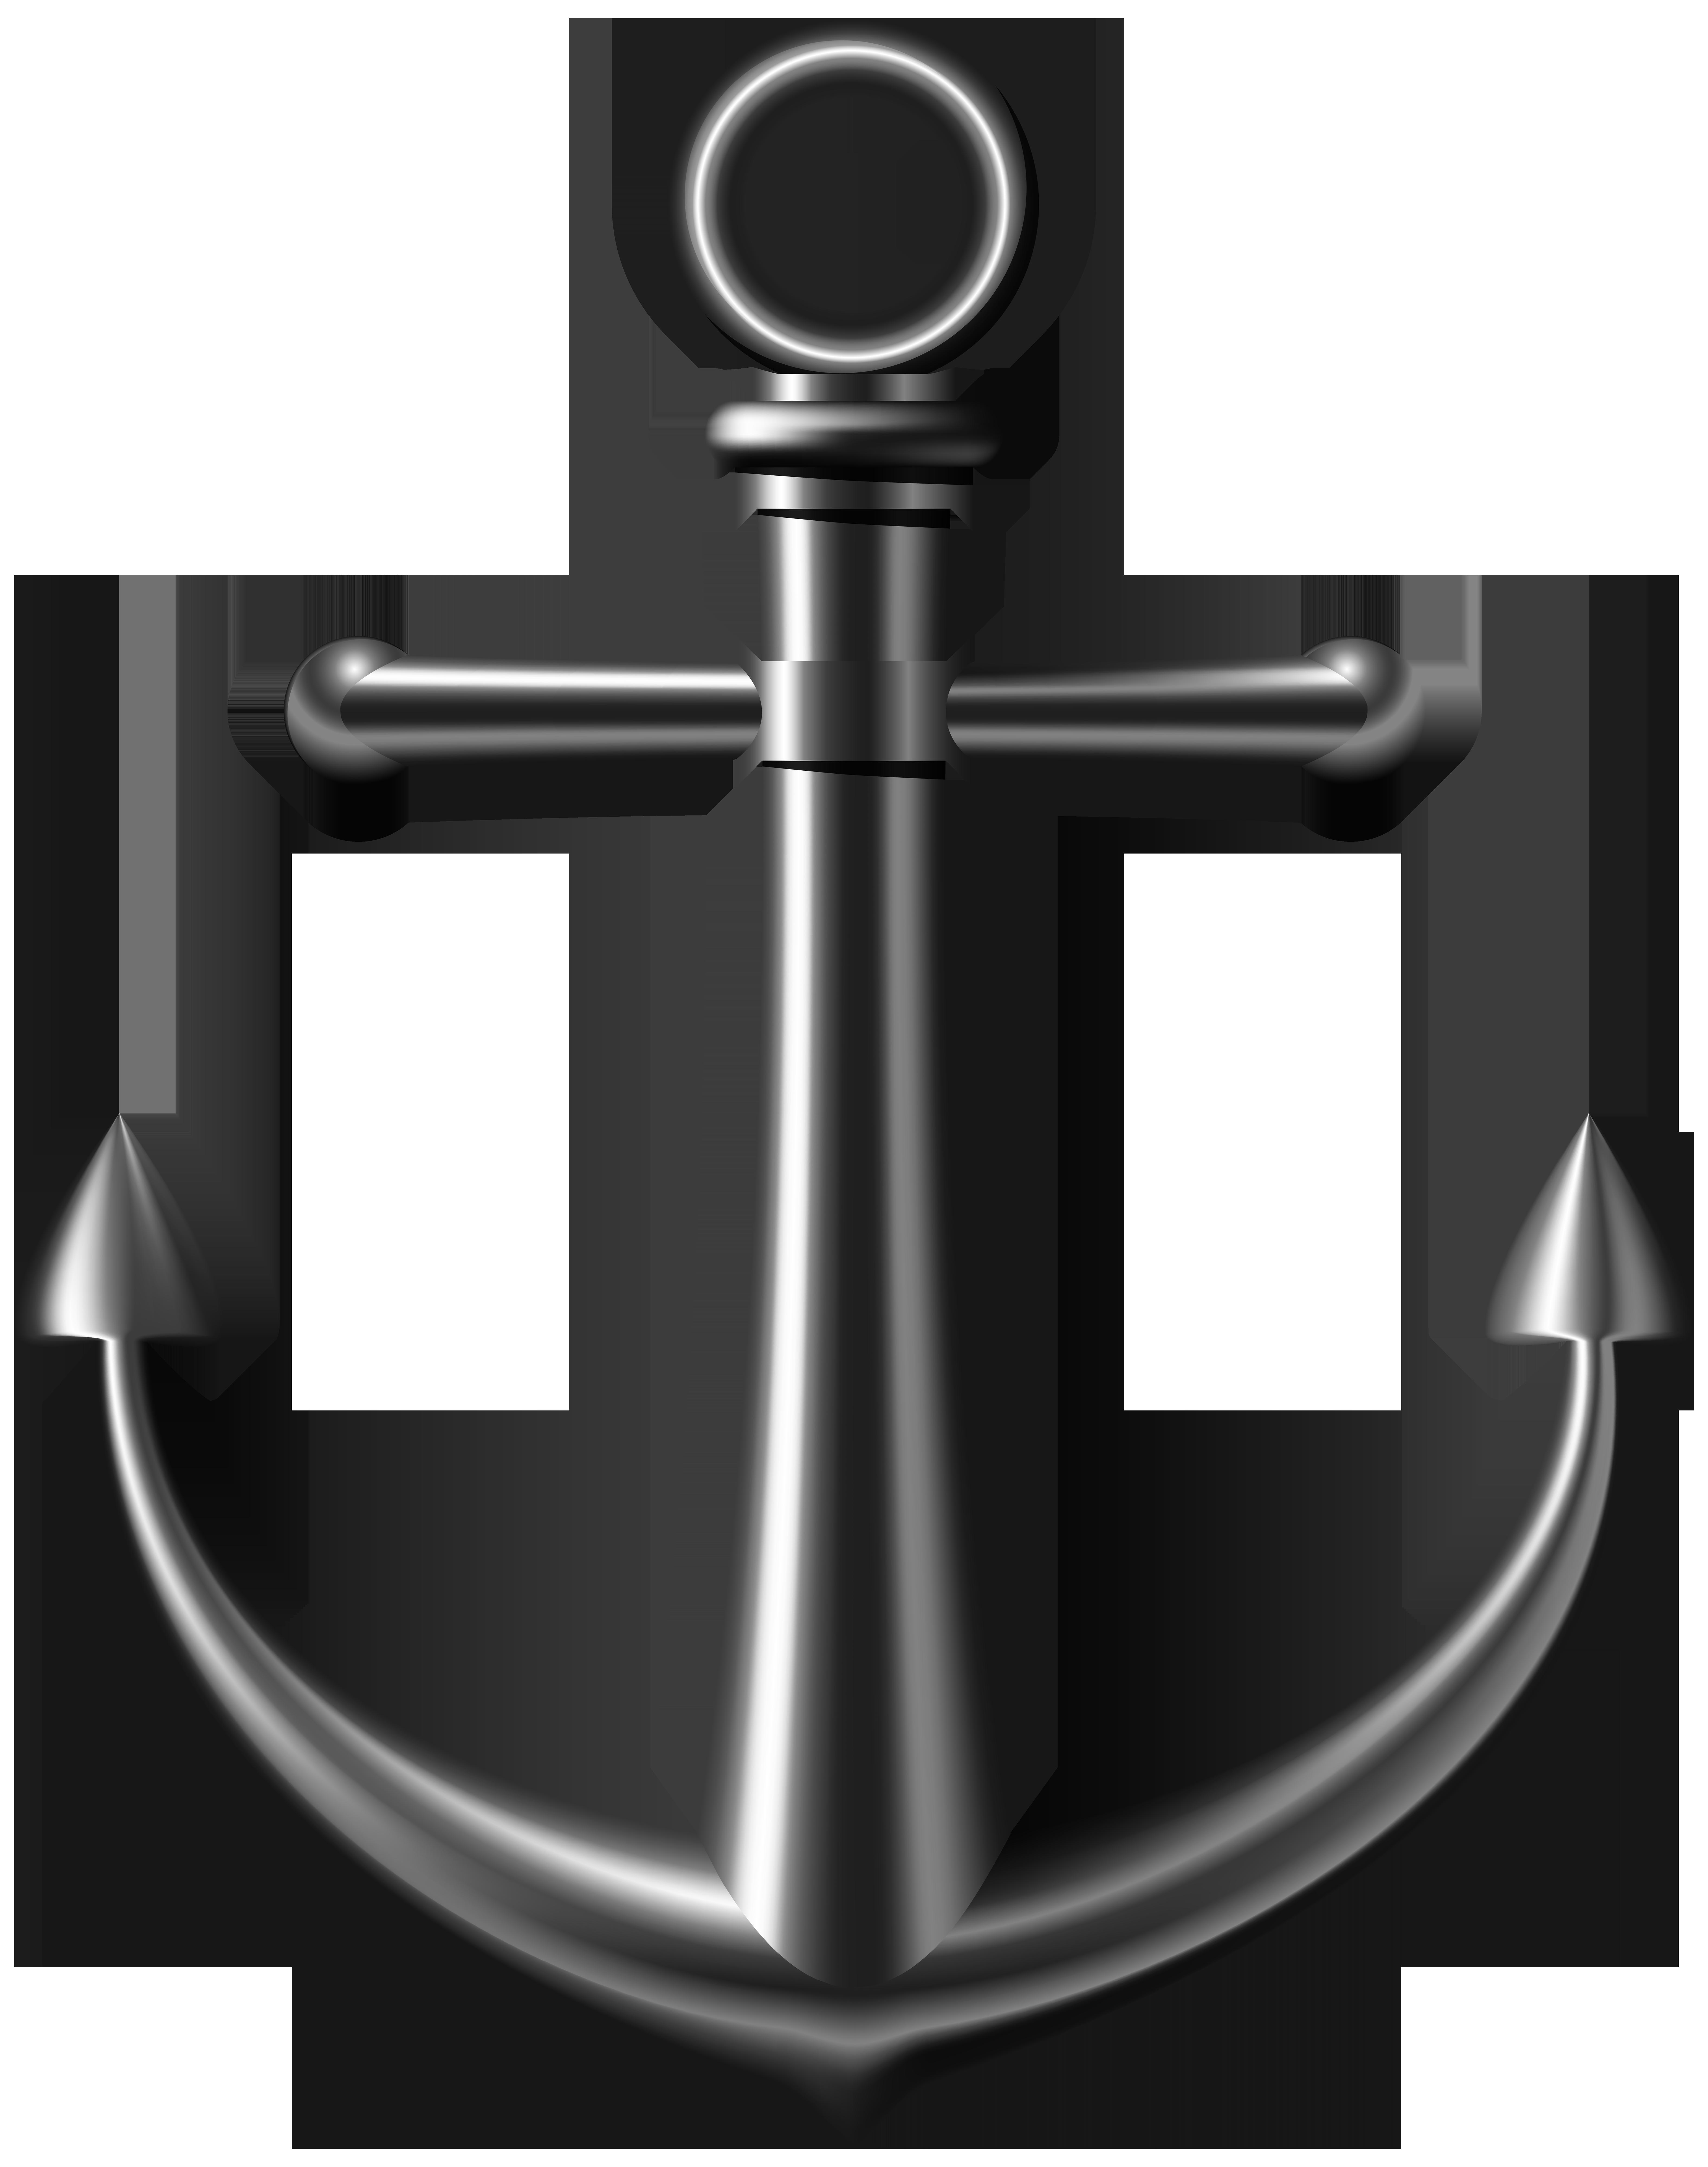 Anchor clipart transparent background. Png clip art image